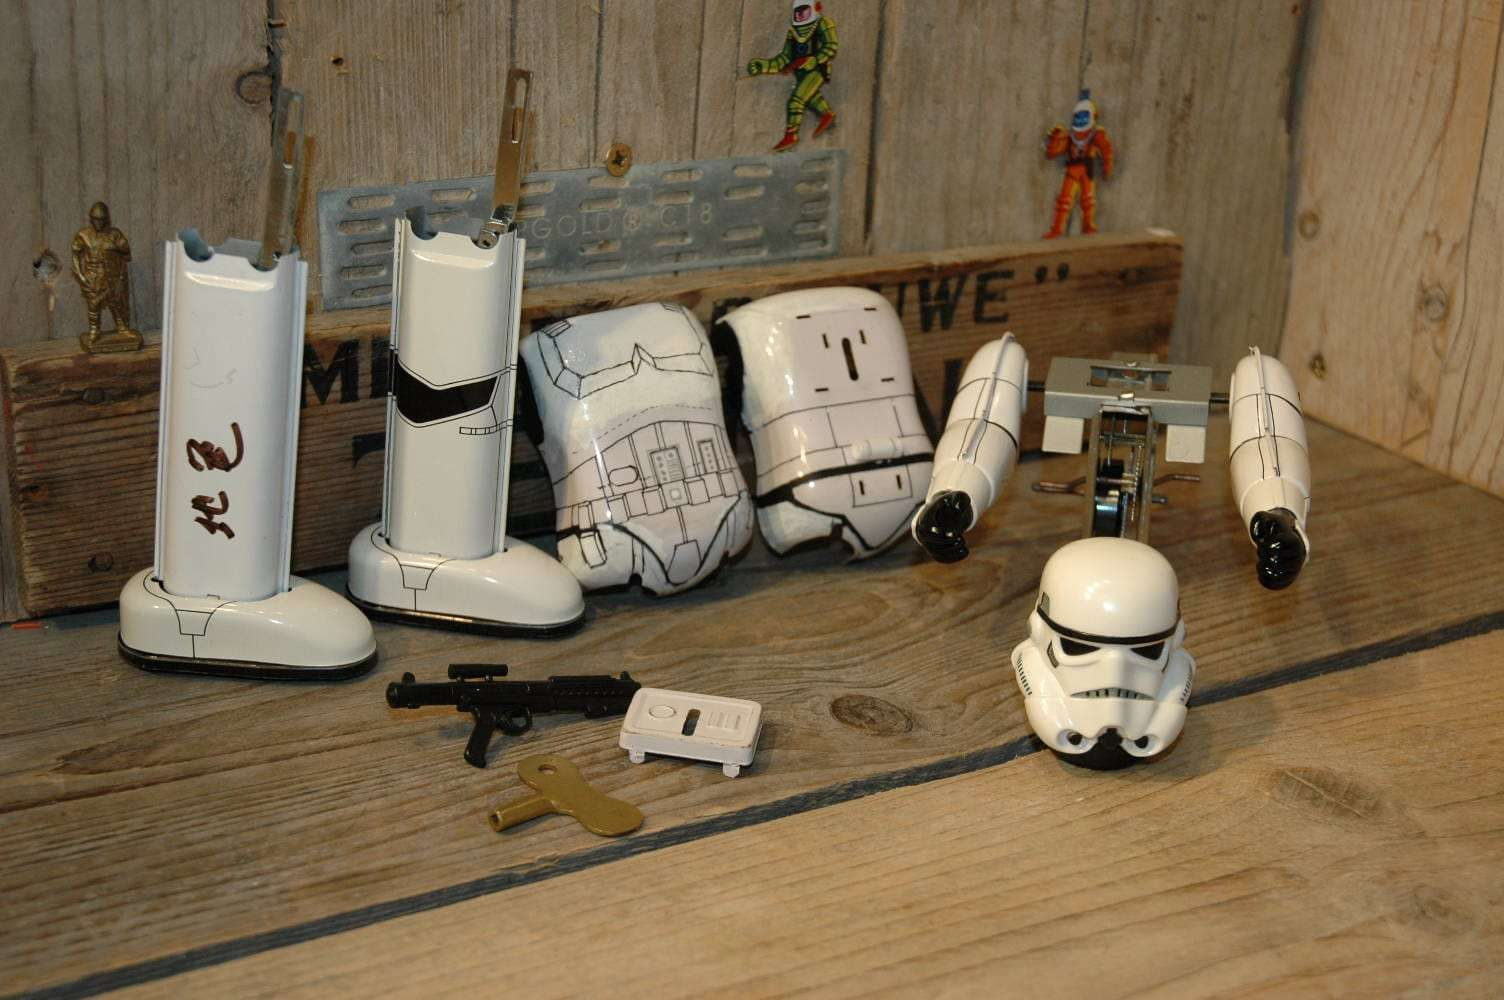 Osaka Tin Toy Institute - StormTrooper Prototype StarWars